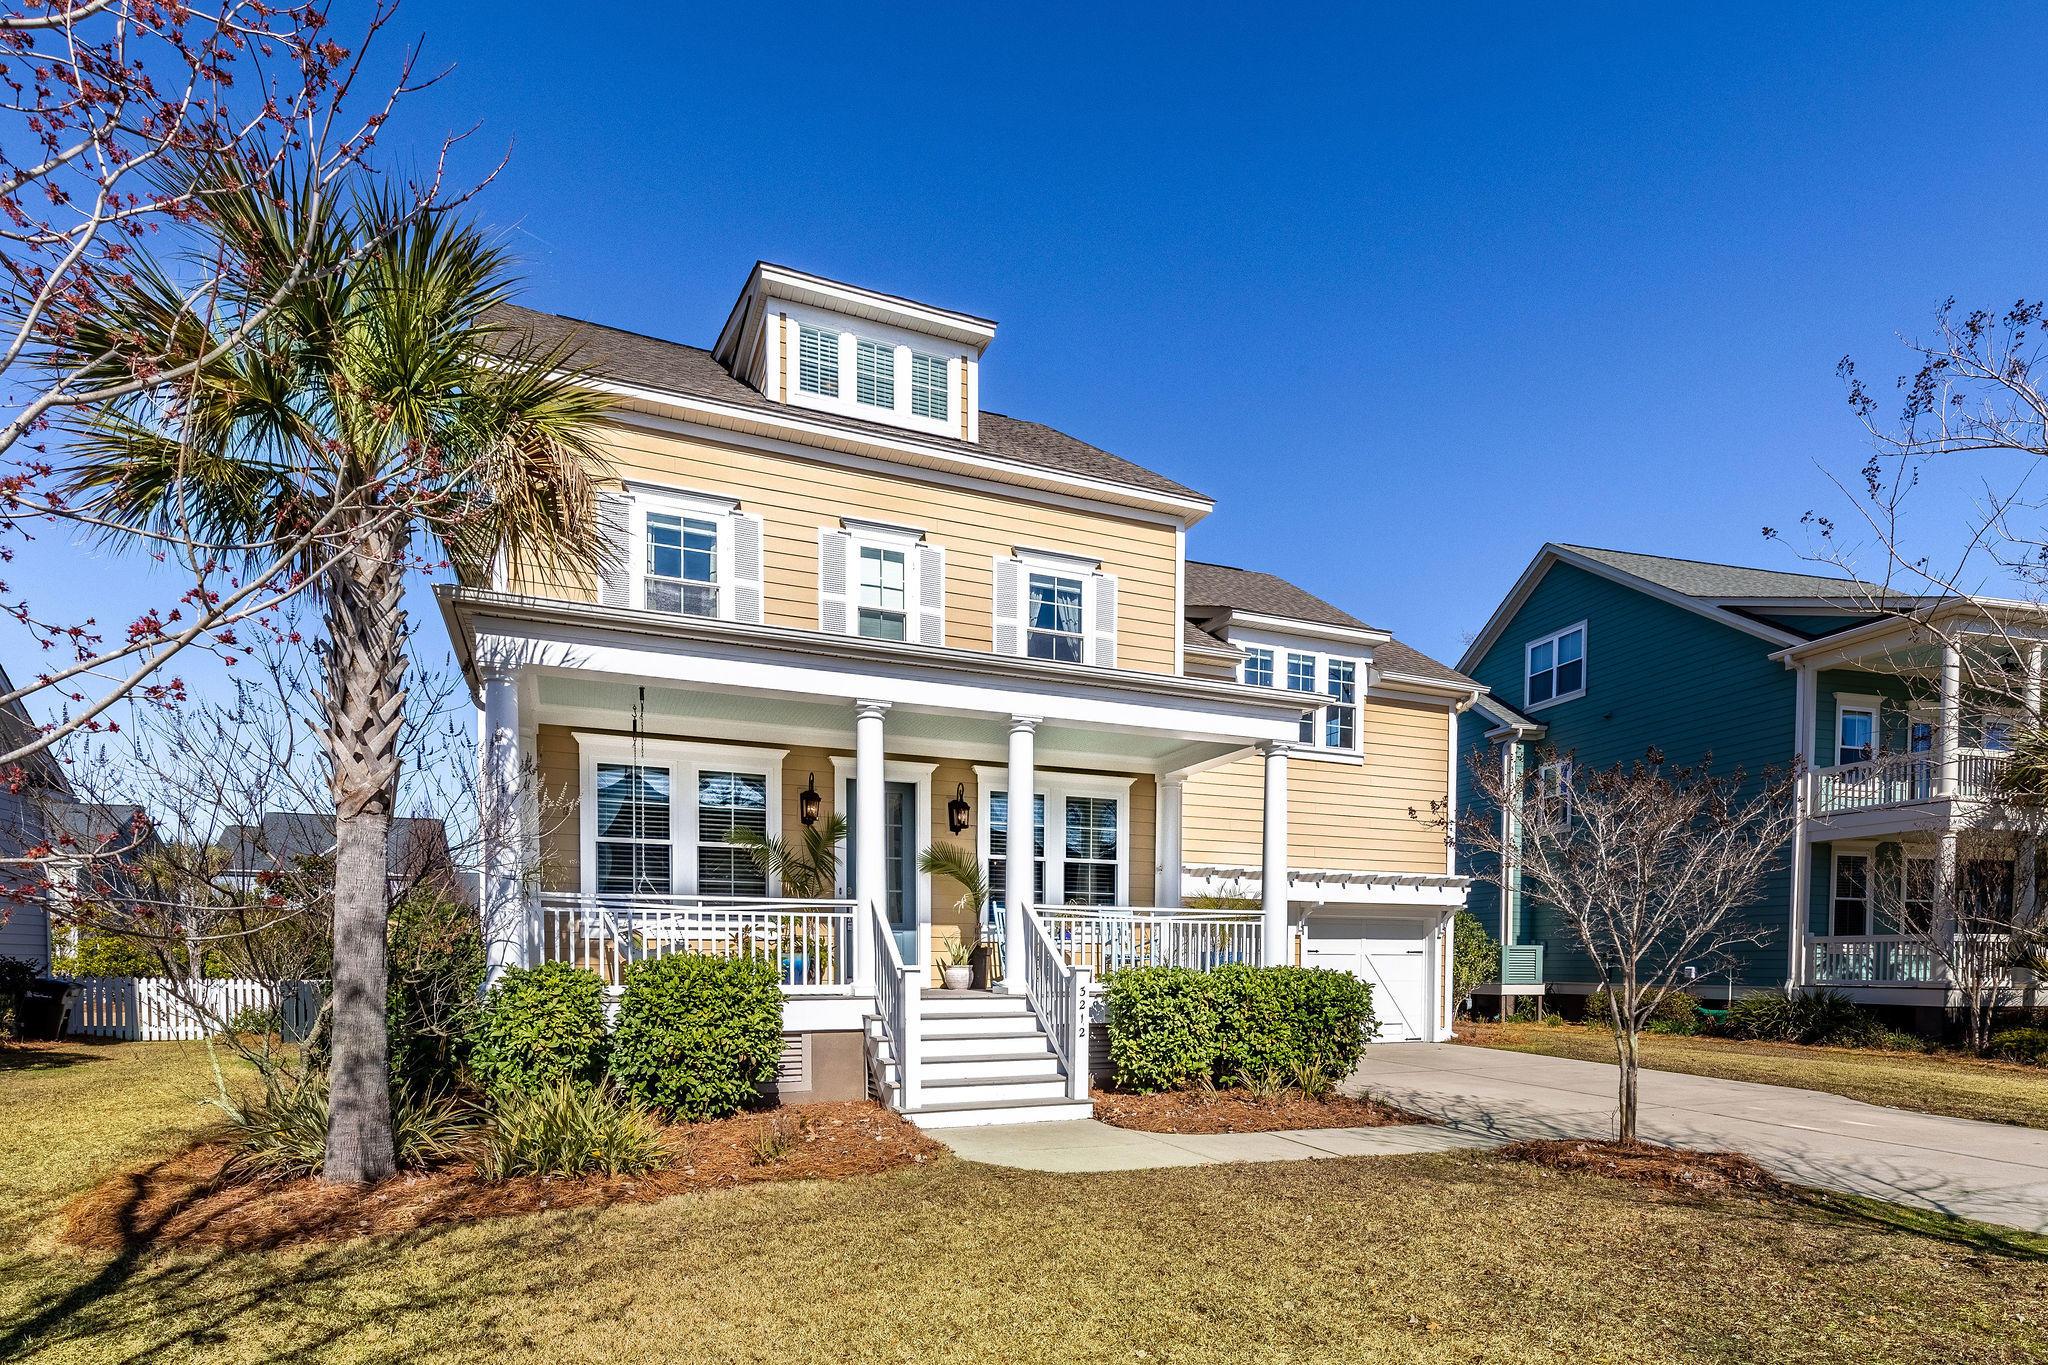 Dunes West Homes For Sale - 3212 Hatchway, Mount Pleasant, SC - 41